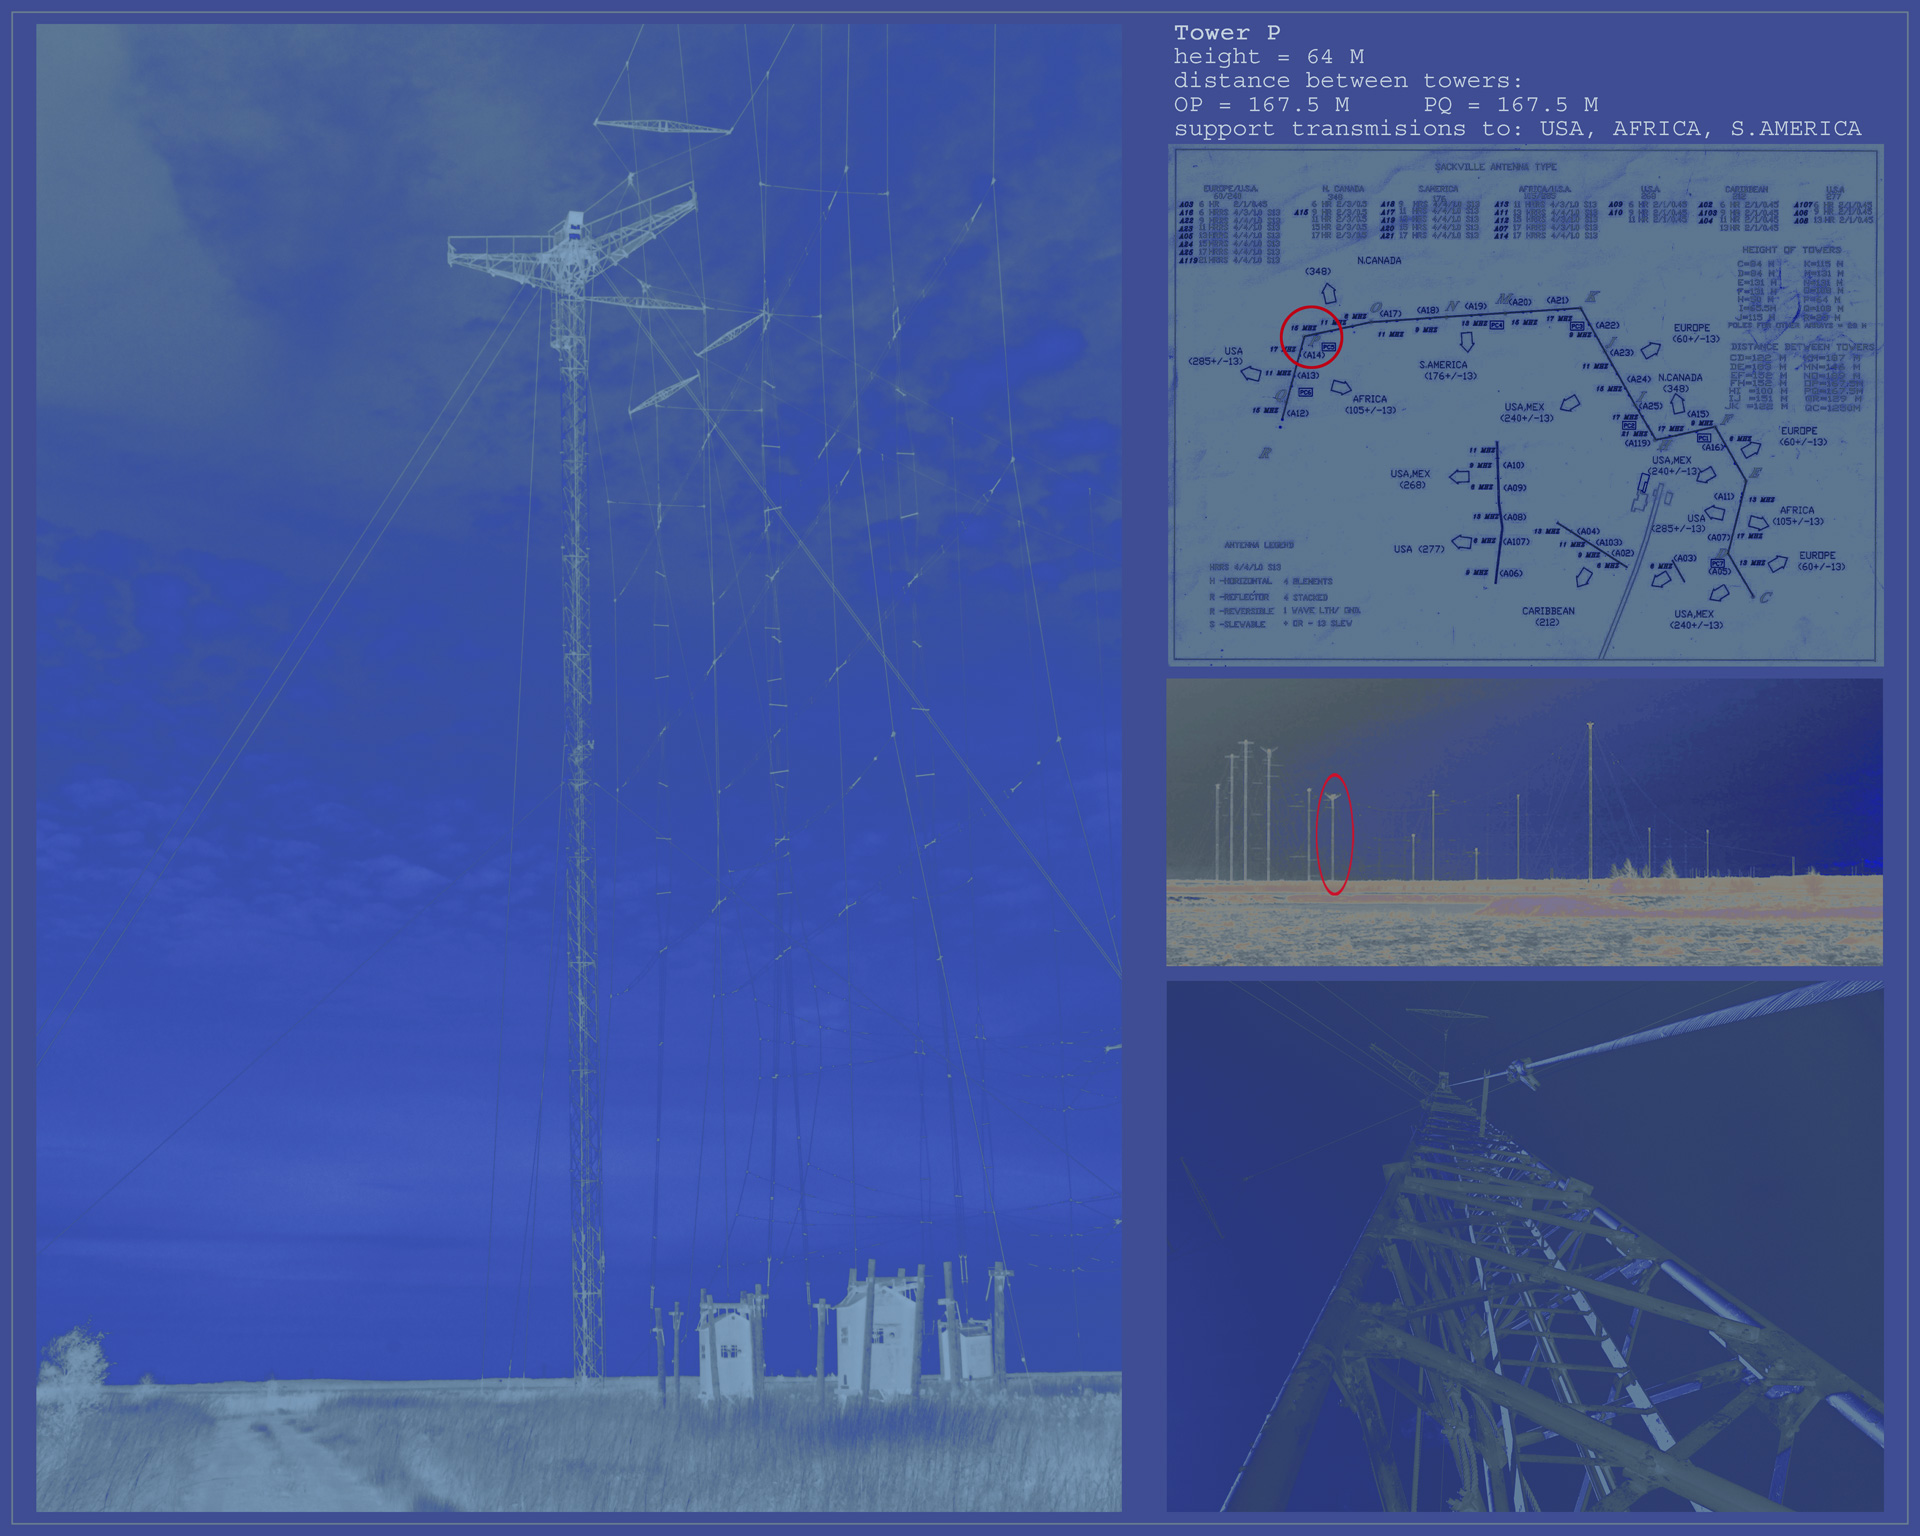 Requiem for Radio: Pulse Decay - P tower